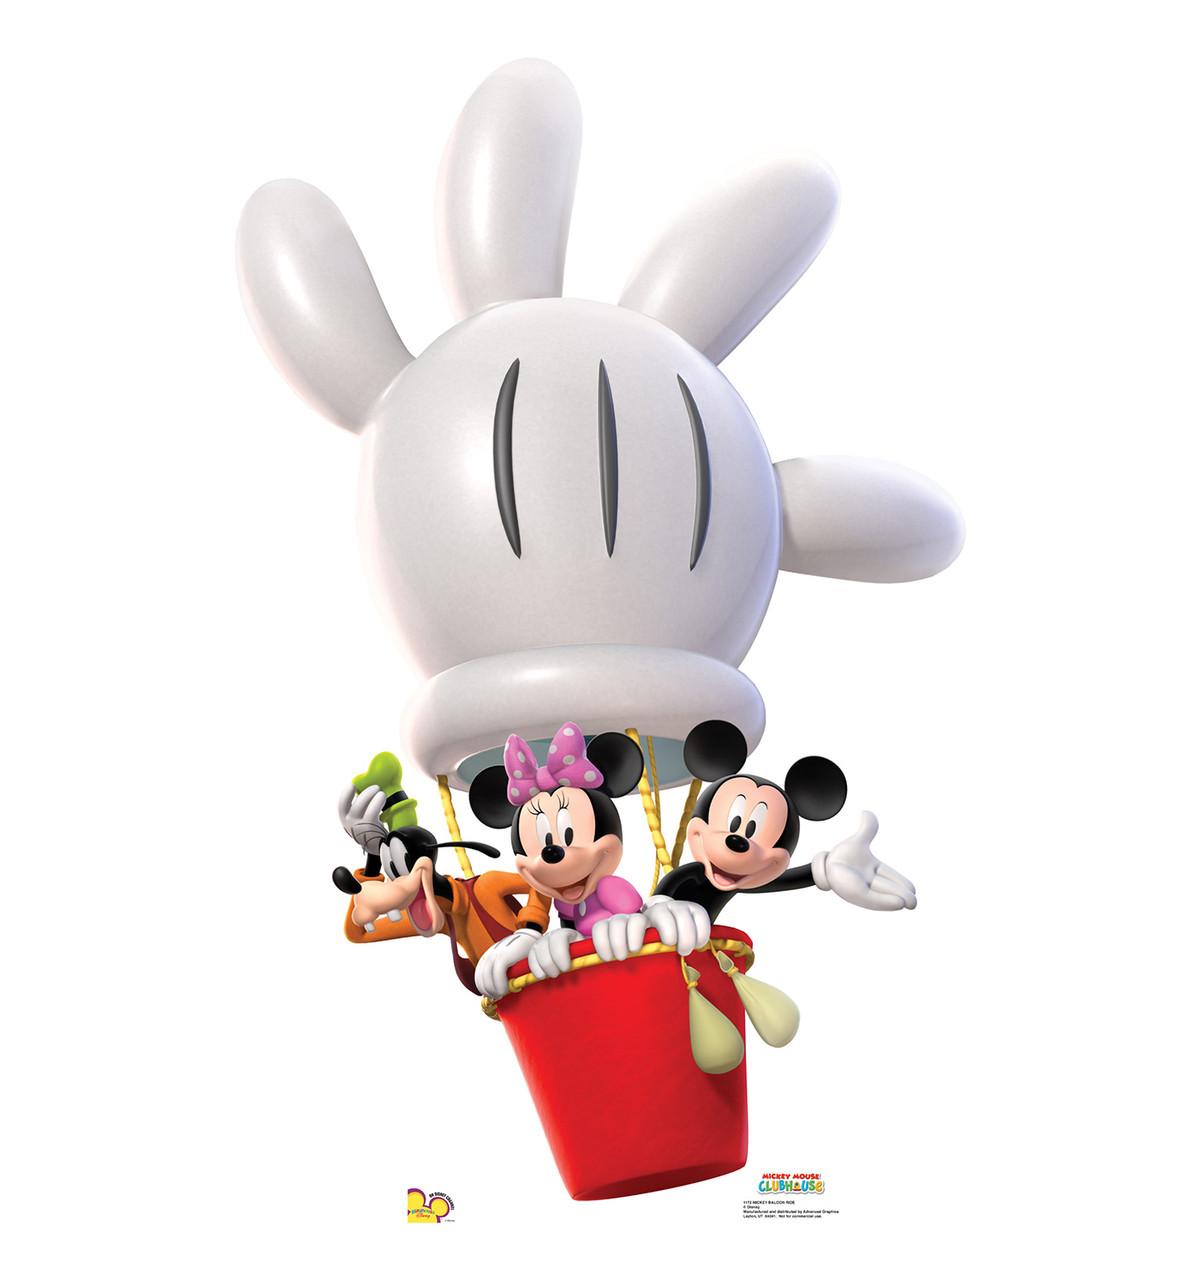 Life-size Mickey Balloon Ride Cardboard Standup   Cardboard Cutout